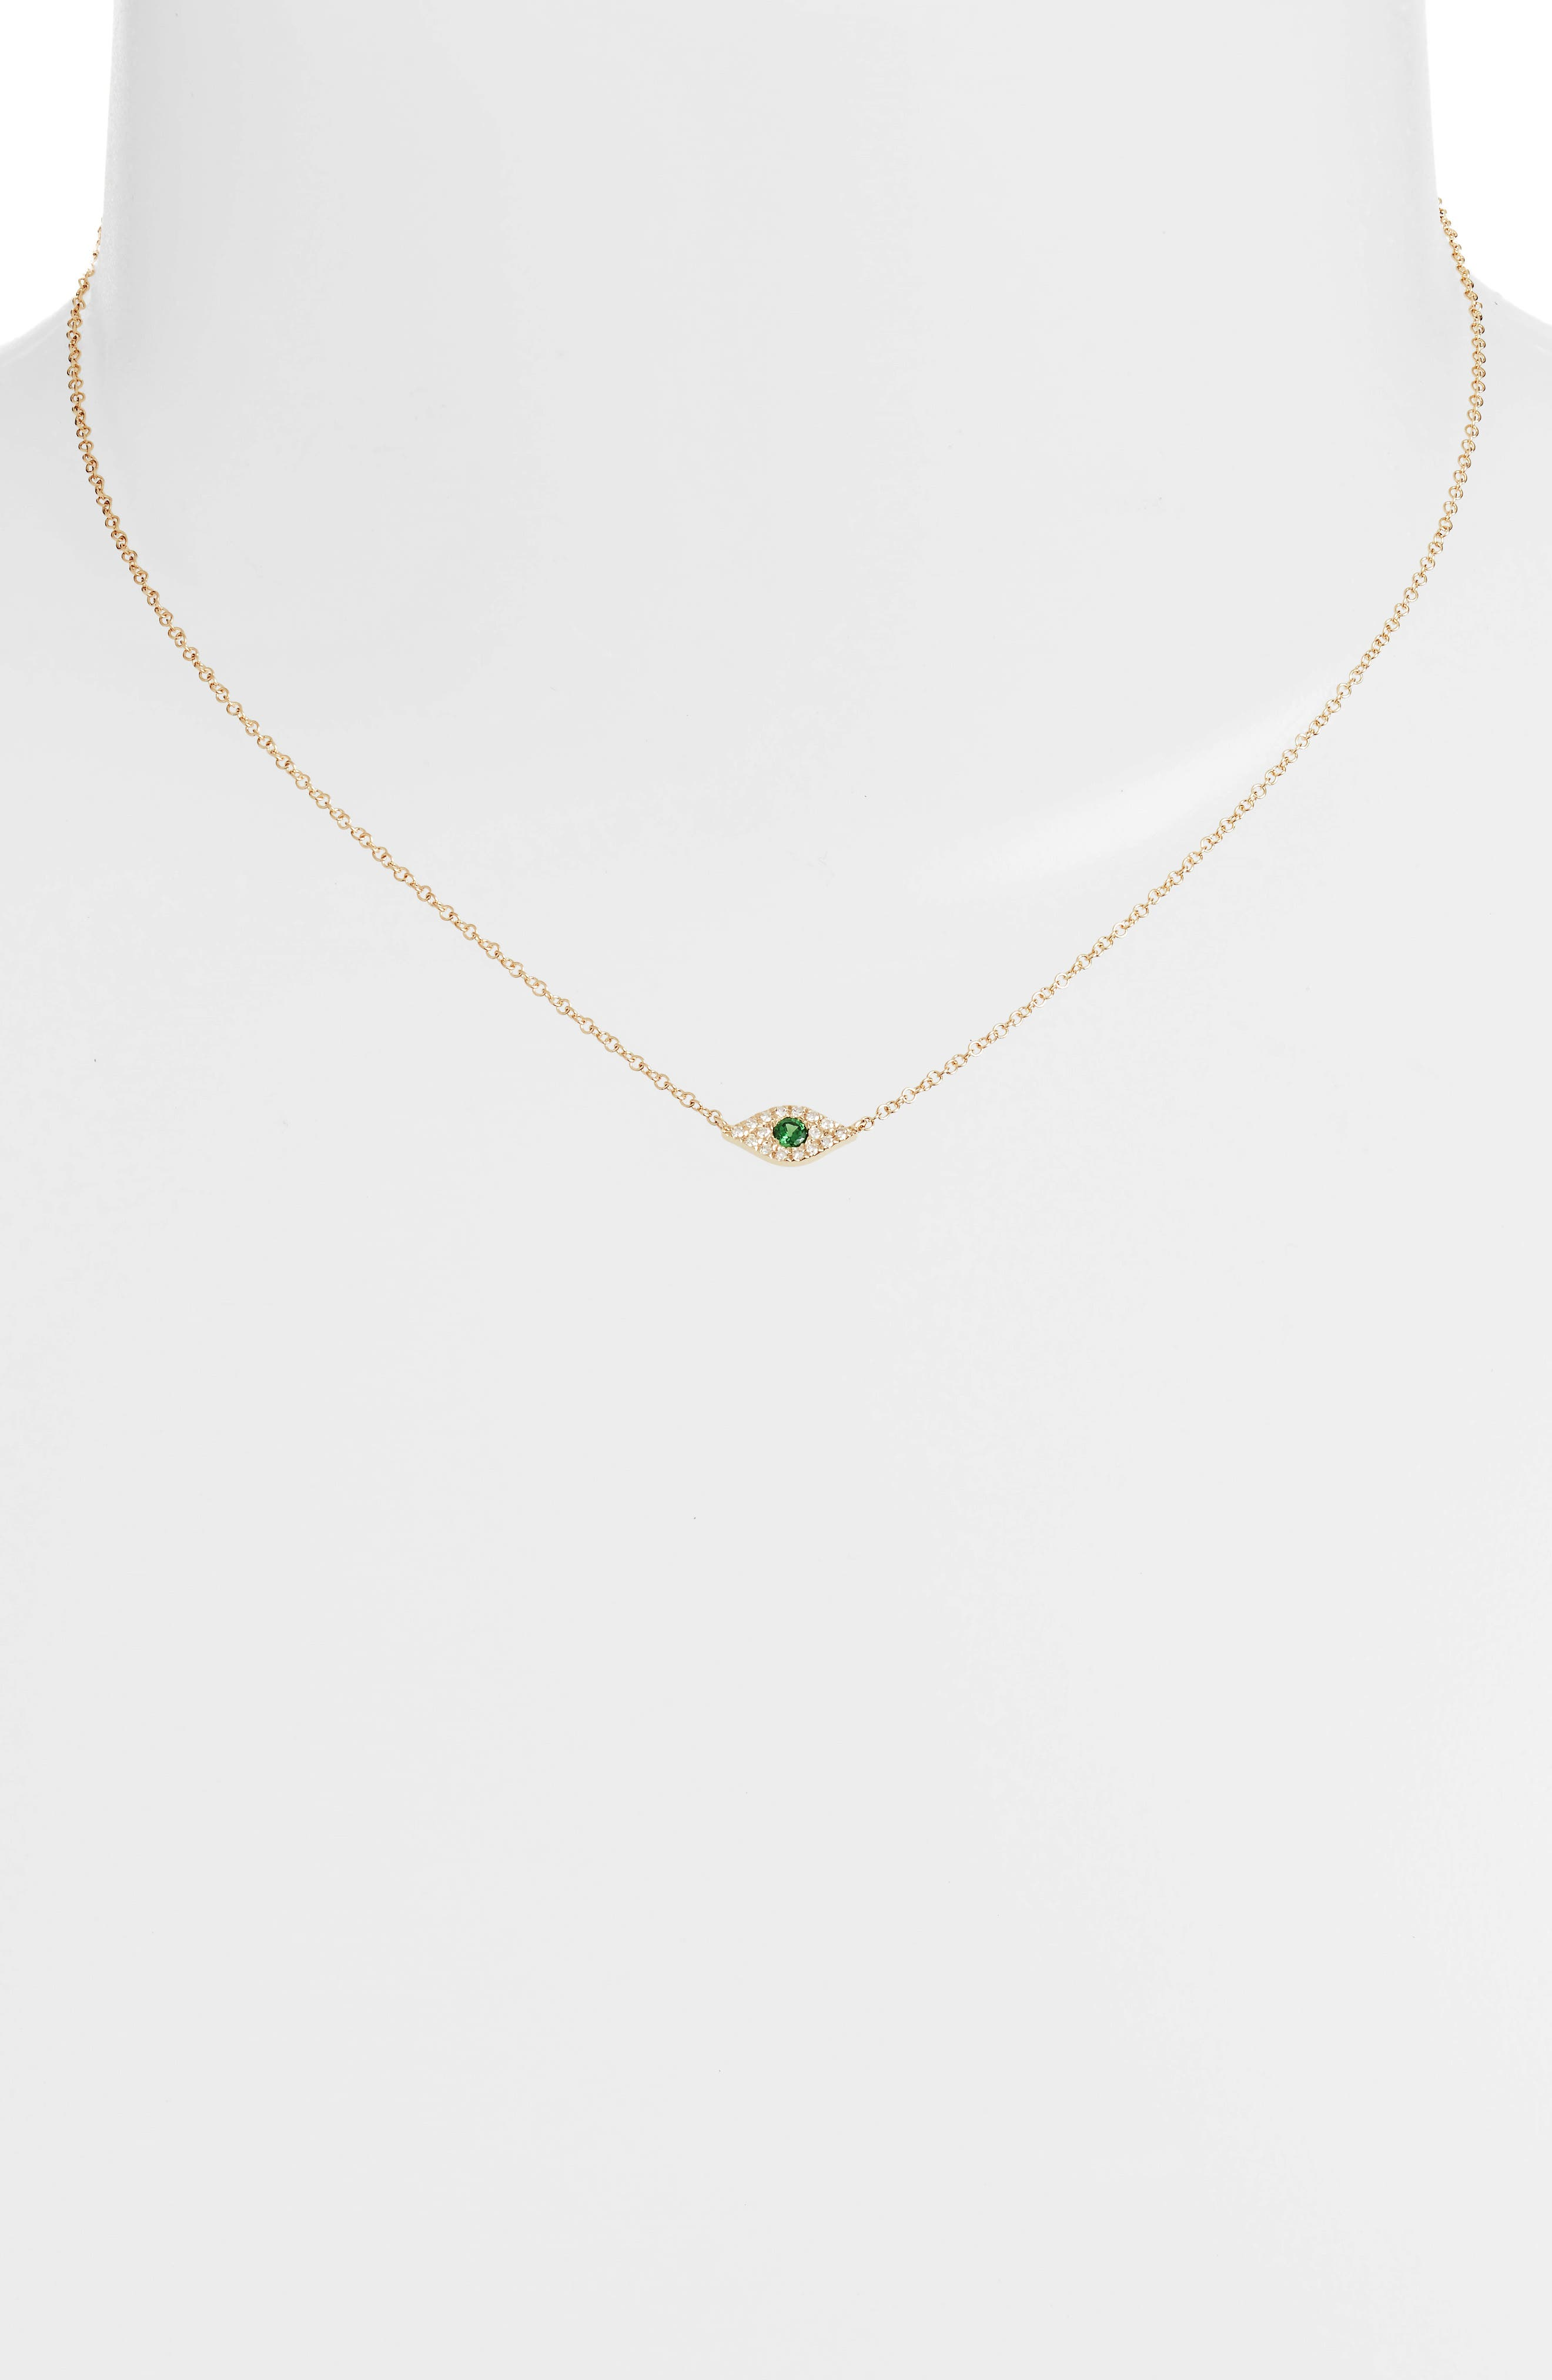 Evil Eye Diamond & Sapphire Pendant Necklace,                             Alternate thumbnail 2, color,                             YELLOW GOLD/ TSAVORITE